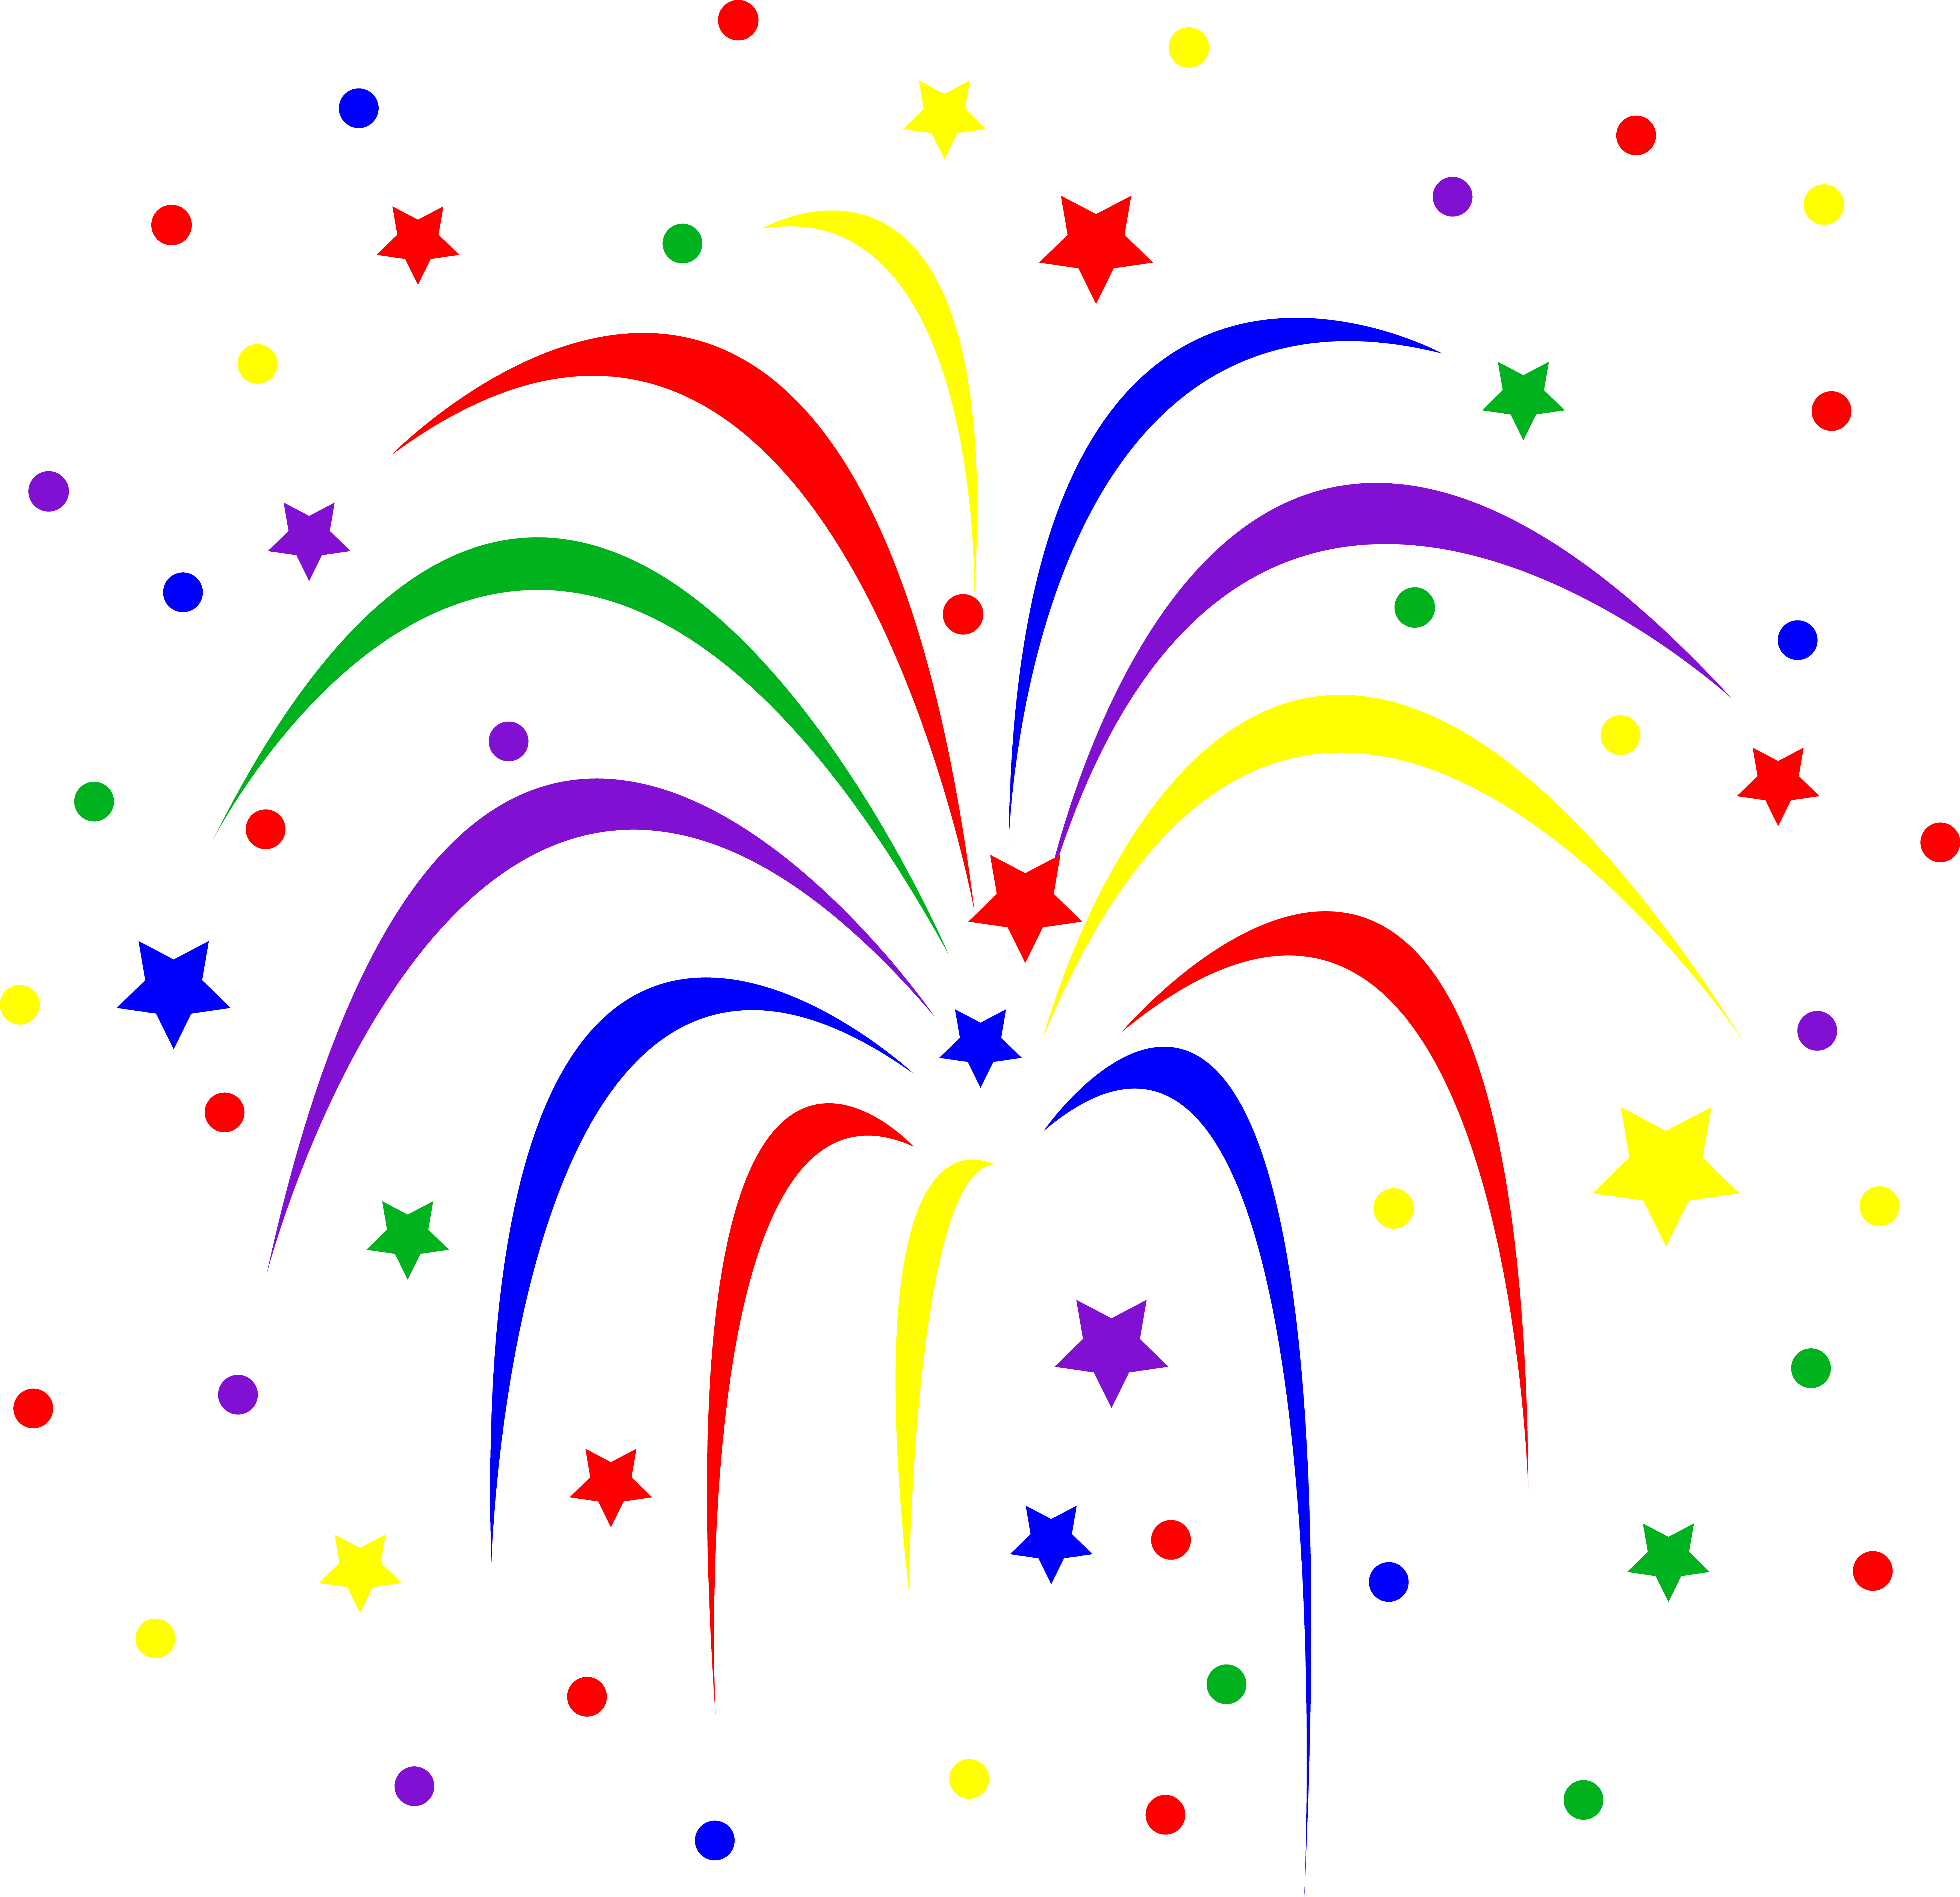 vector transparent library Google image result for. Bonfire clipart firework.